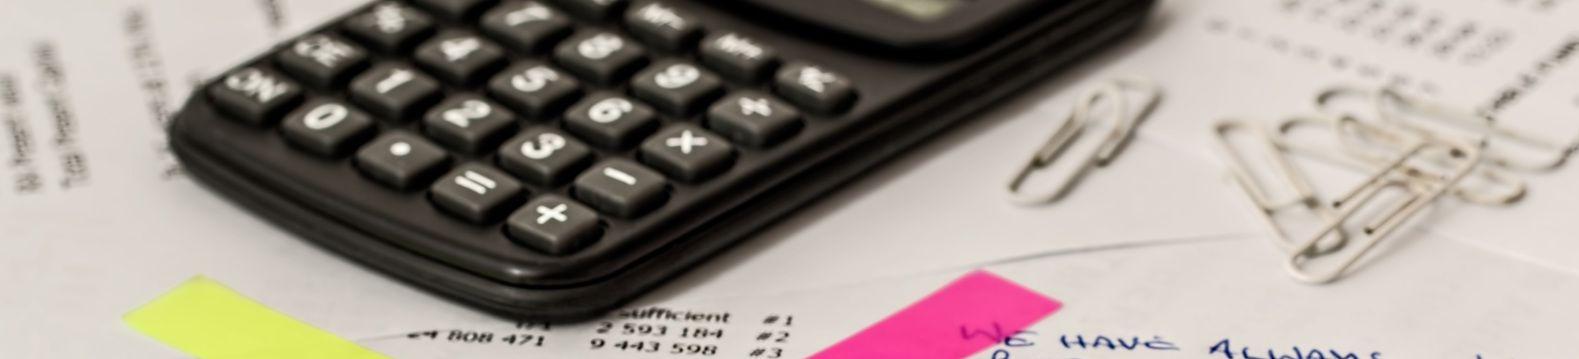 rekenrente letselschadevergoeding in het voordeel van slachtoffer